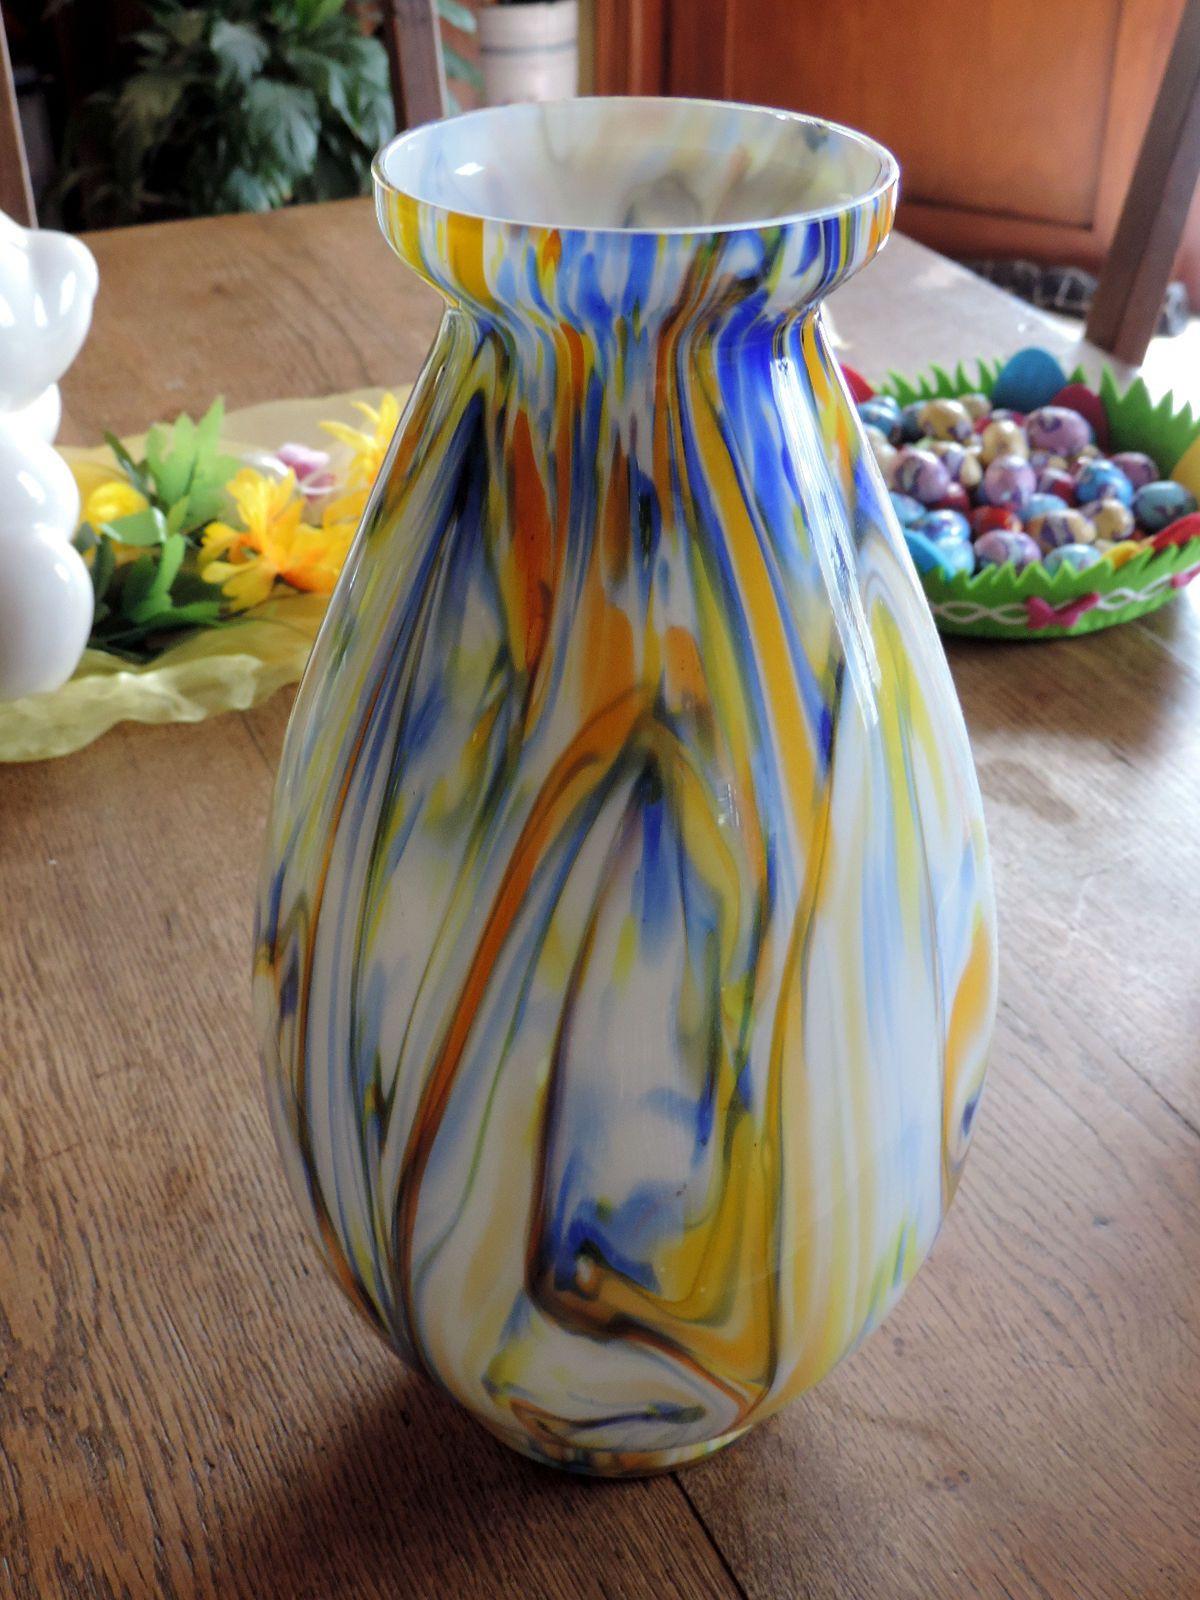 dark green glass vase of vase art deco en verre moula de scailmont manage heemskerk catteau for vase art deco en verre moula de scailmont manage heemskerk catteau ebay